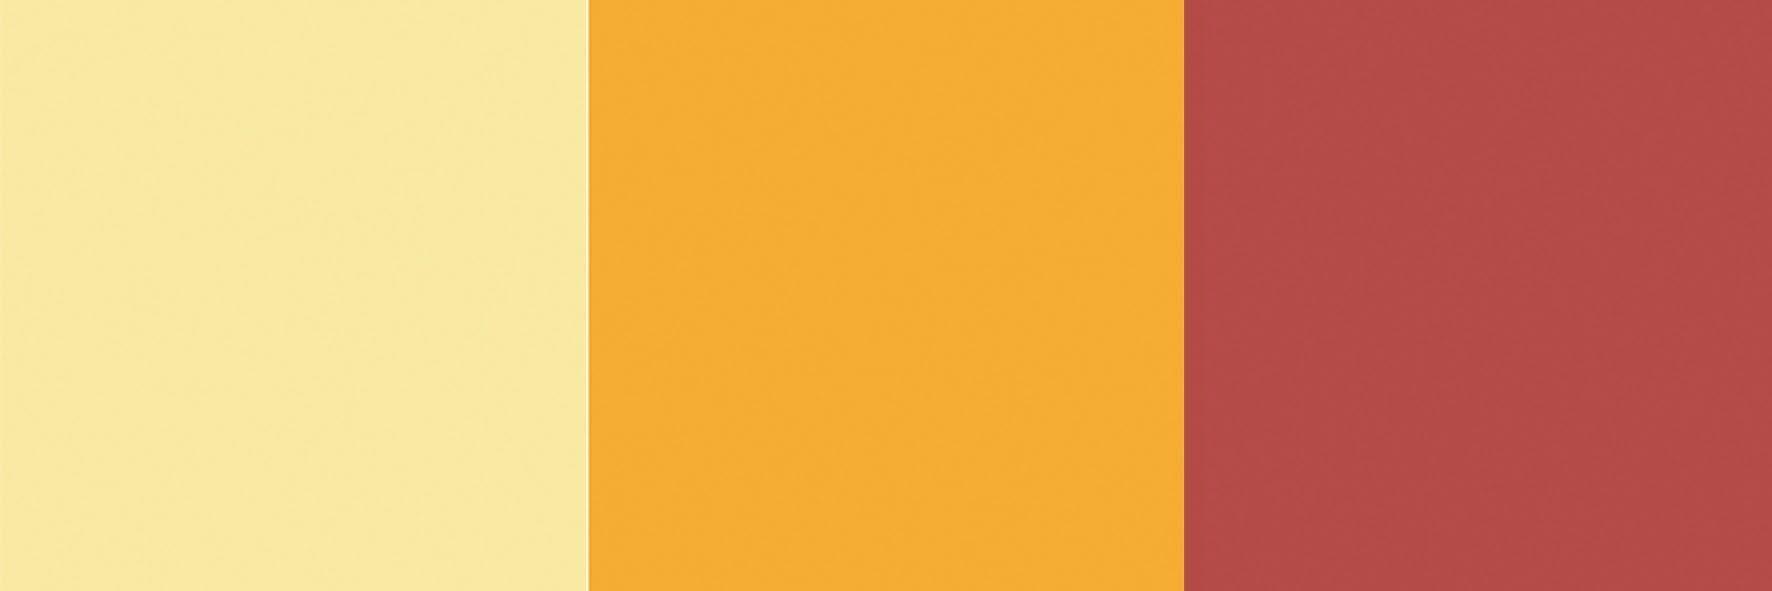 De esquerda para a direita: Suvinil Jasmim Amarelo, Coral Amarelo, Sangria Lukscolor.